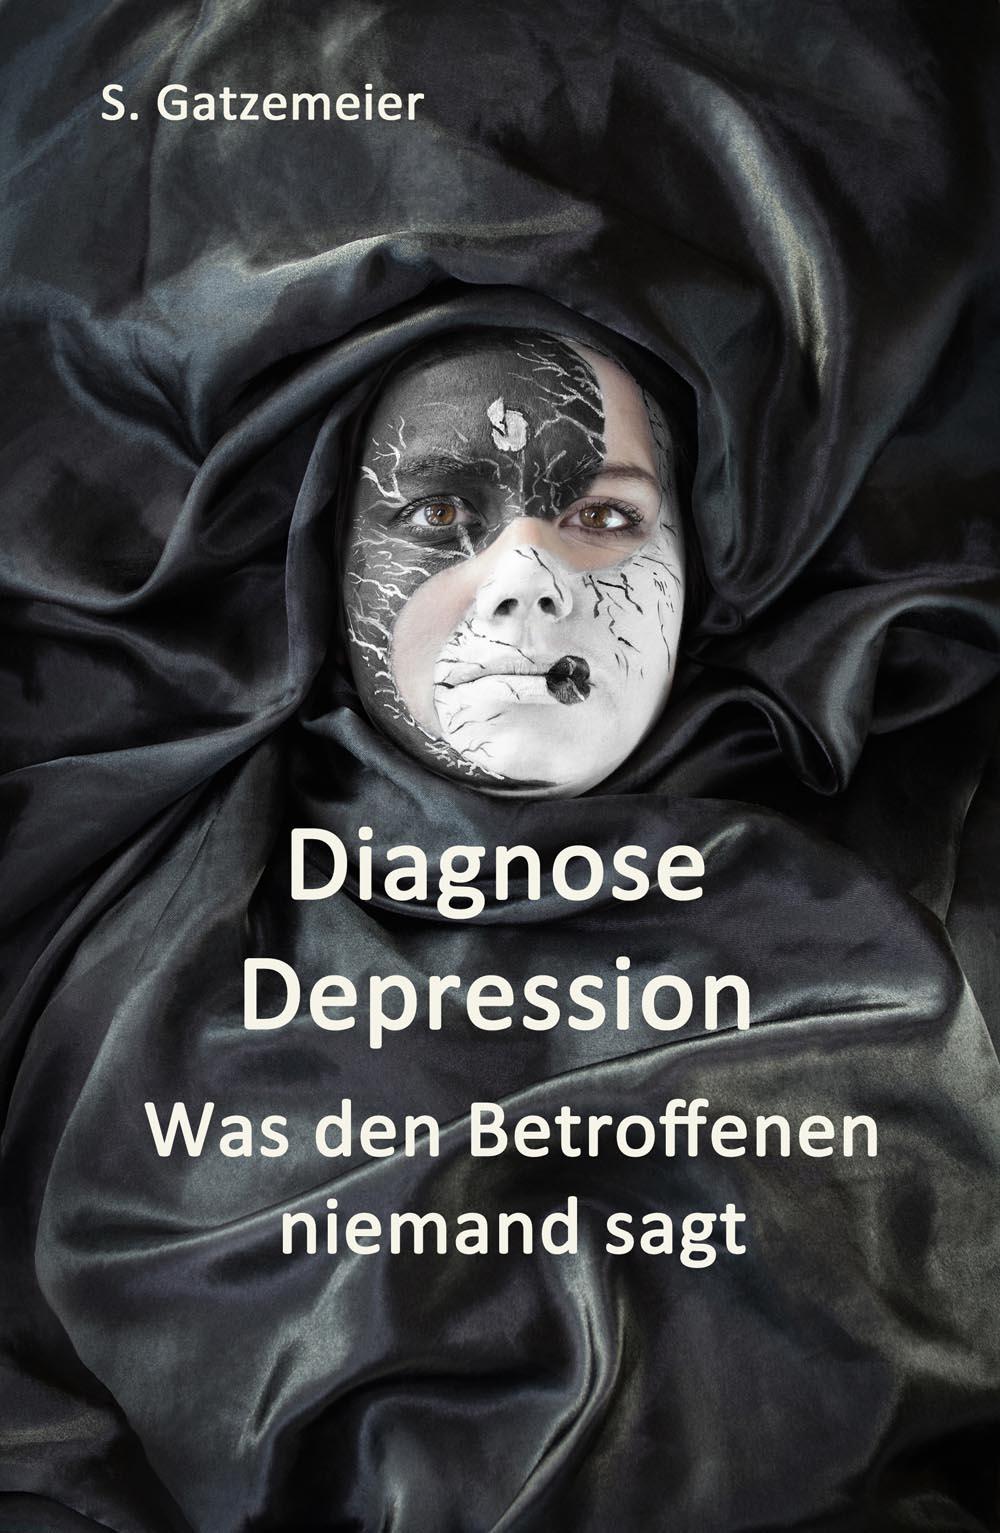 """Diagnose Depression"" Was den Betroffenen niemand sagt"